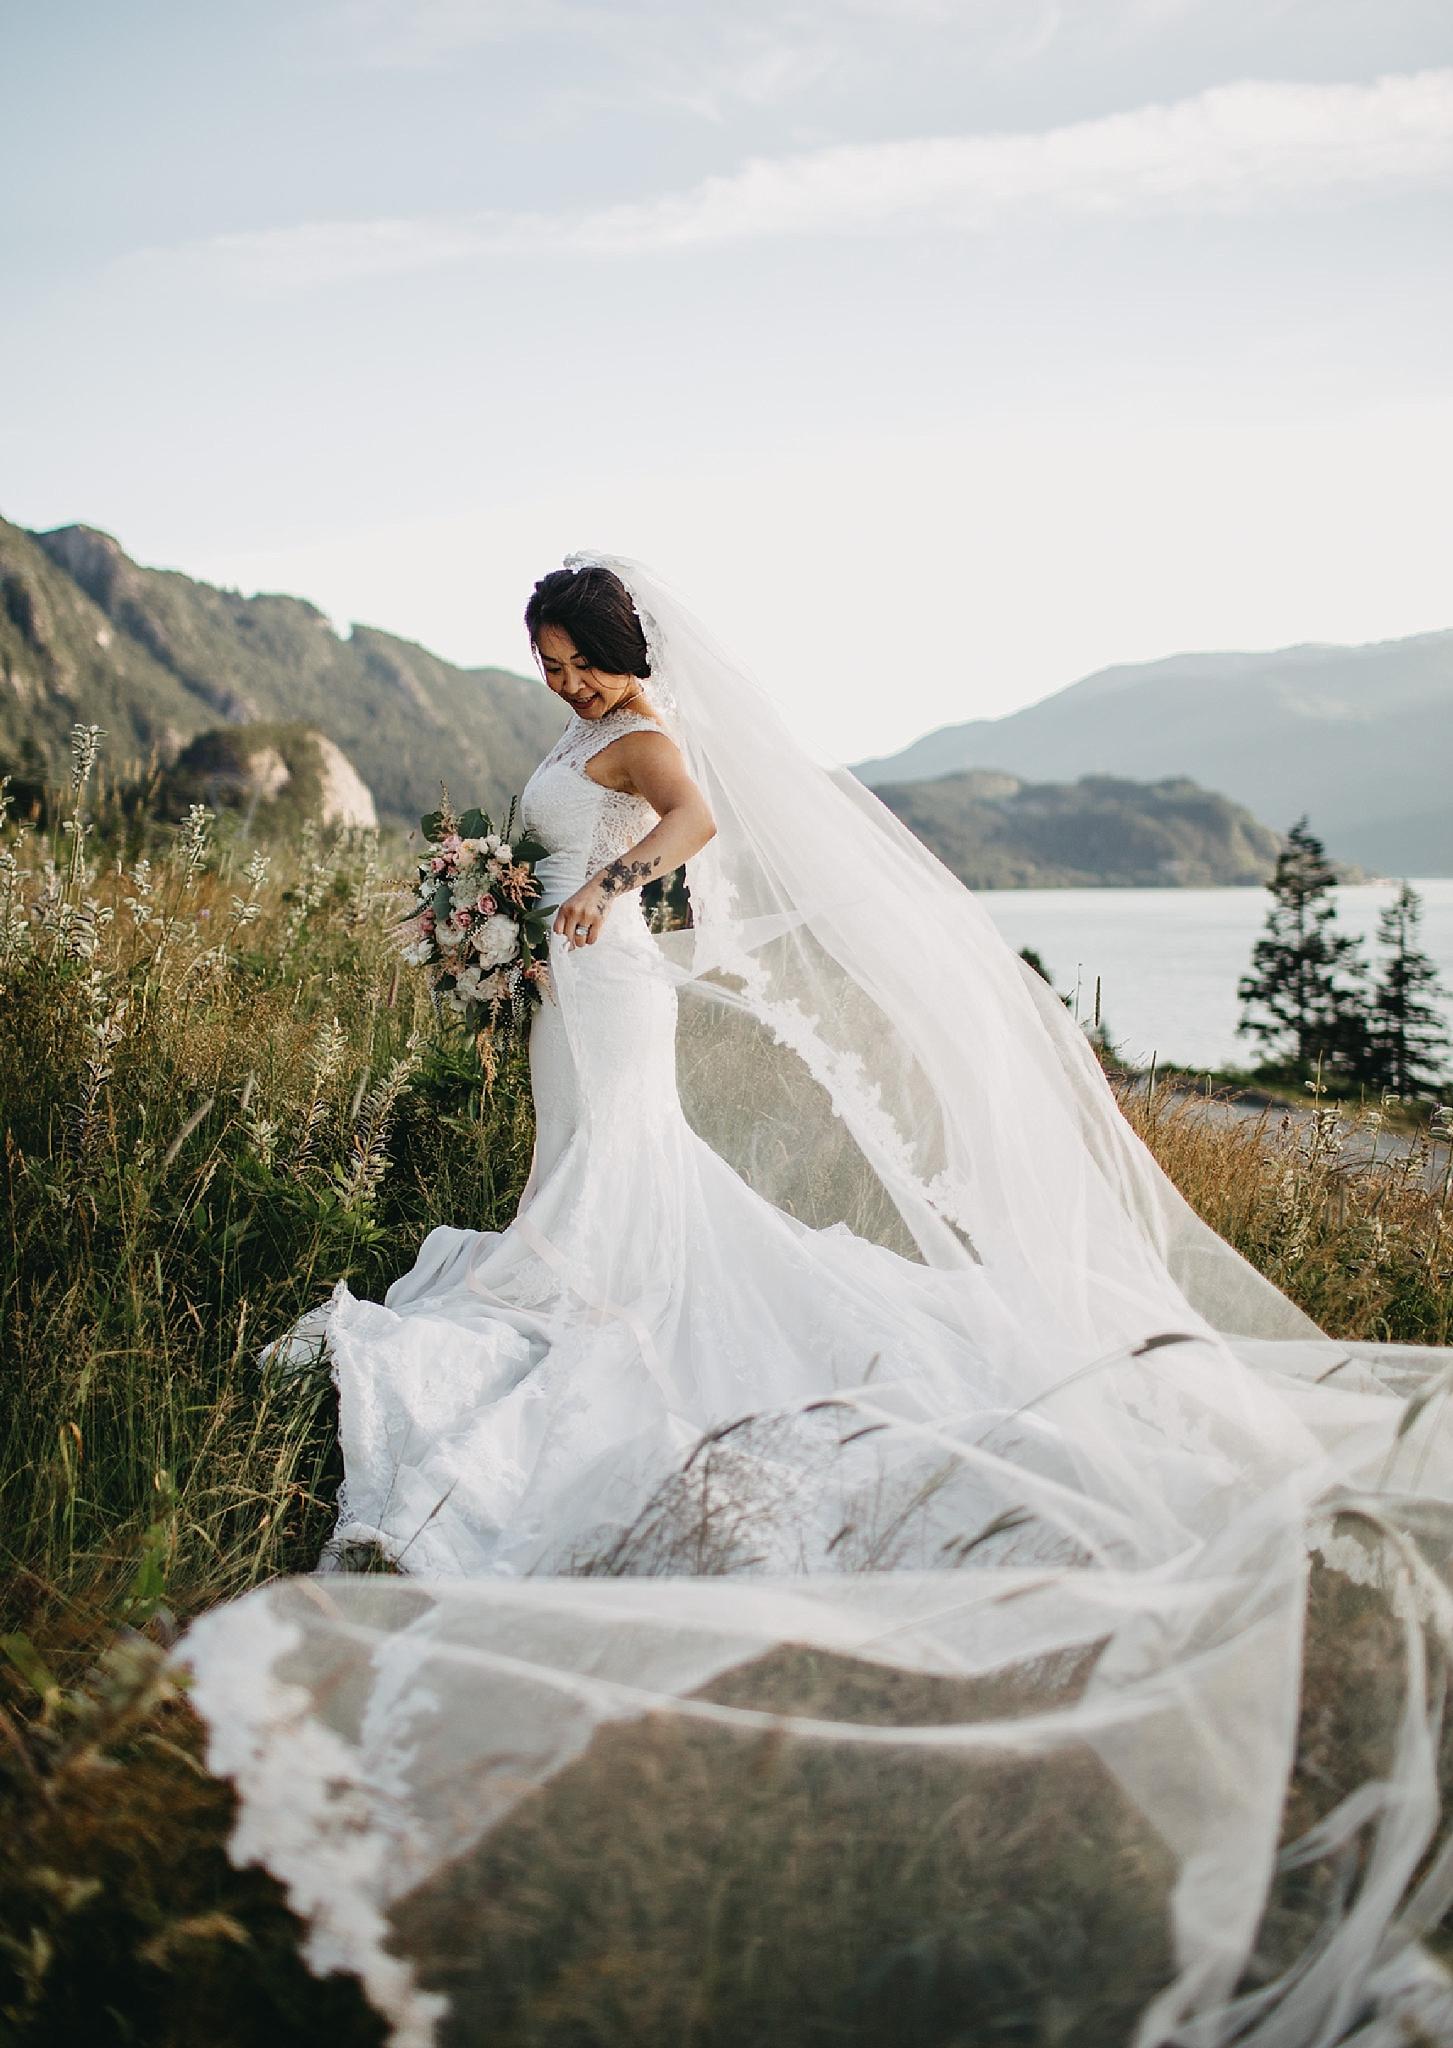 aileen-choi-photo-hart-house-wedding_0096.jpg